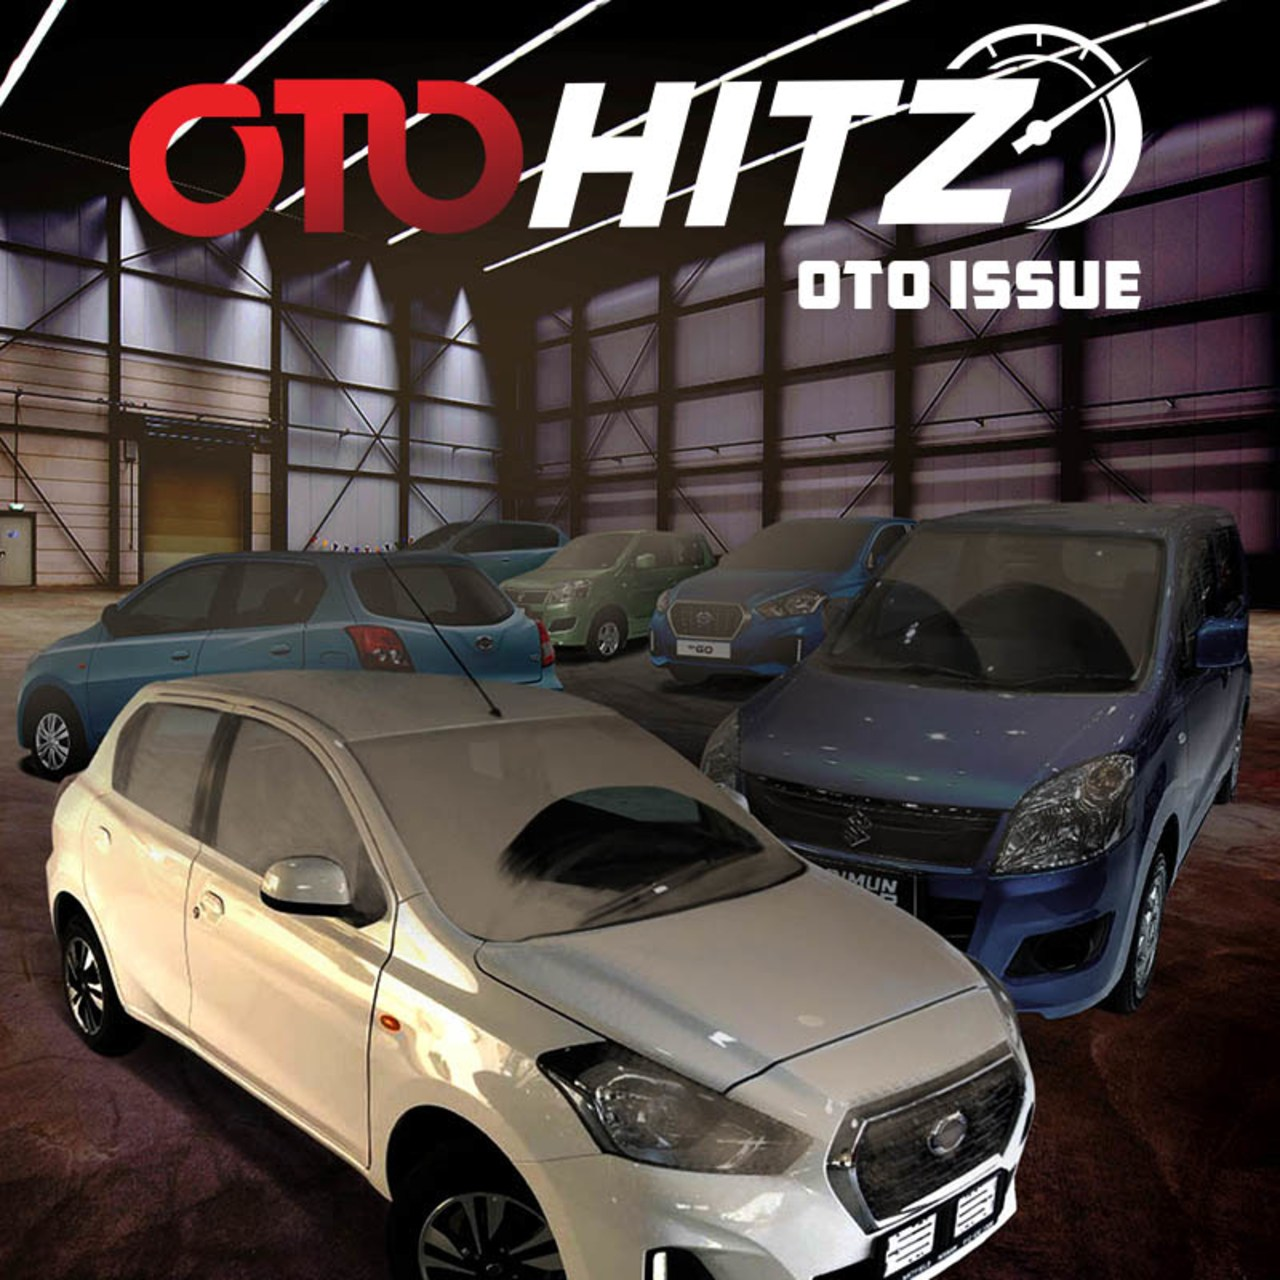 otomotif, otohitz II, otohitz, LCGC, mobil murah